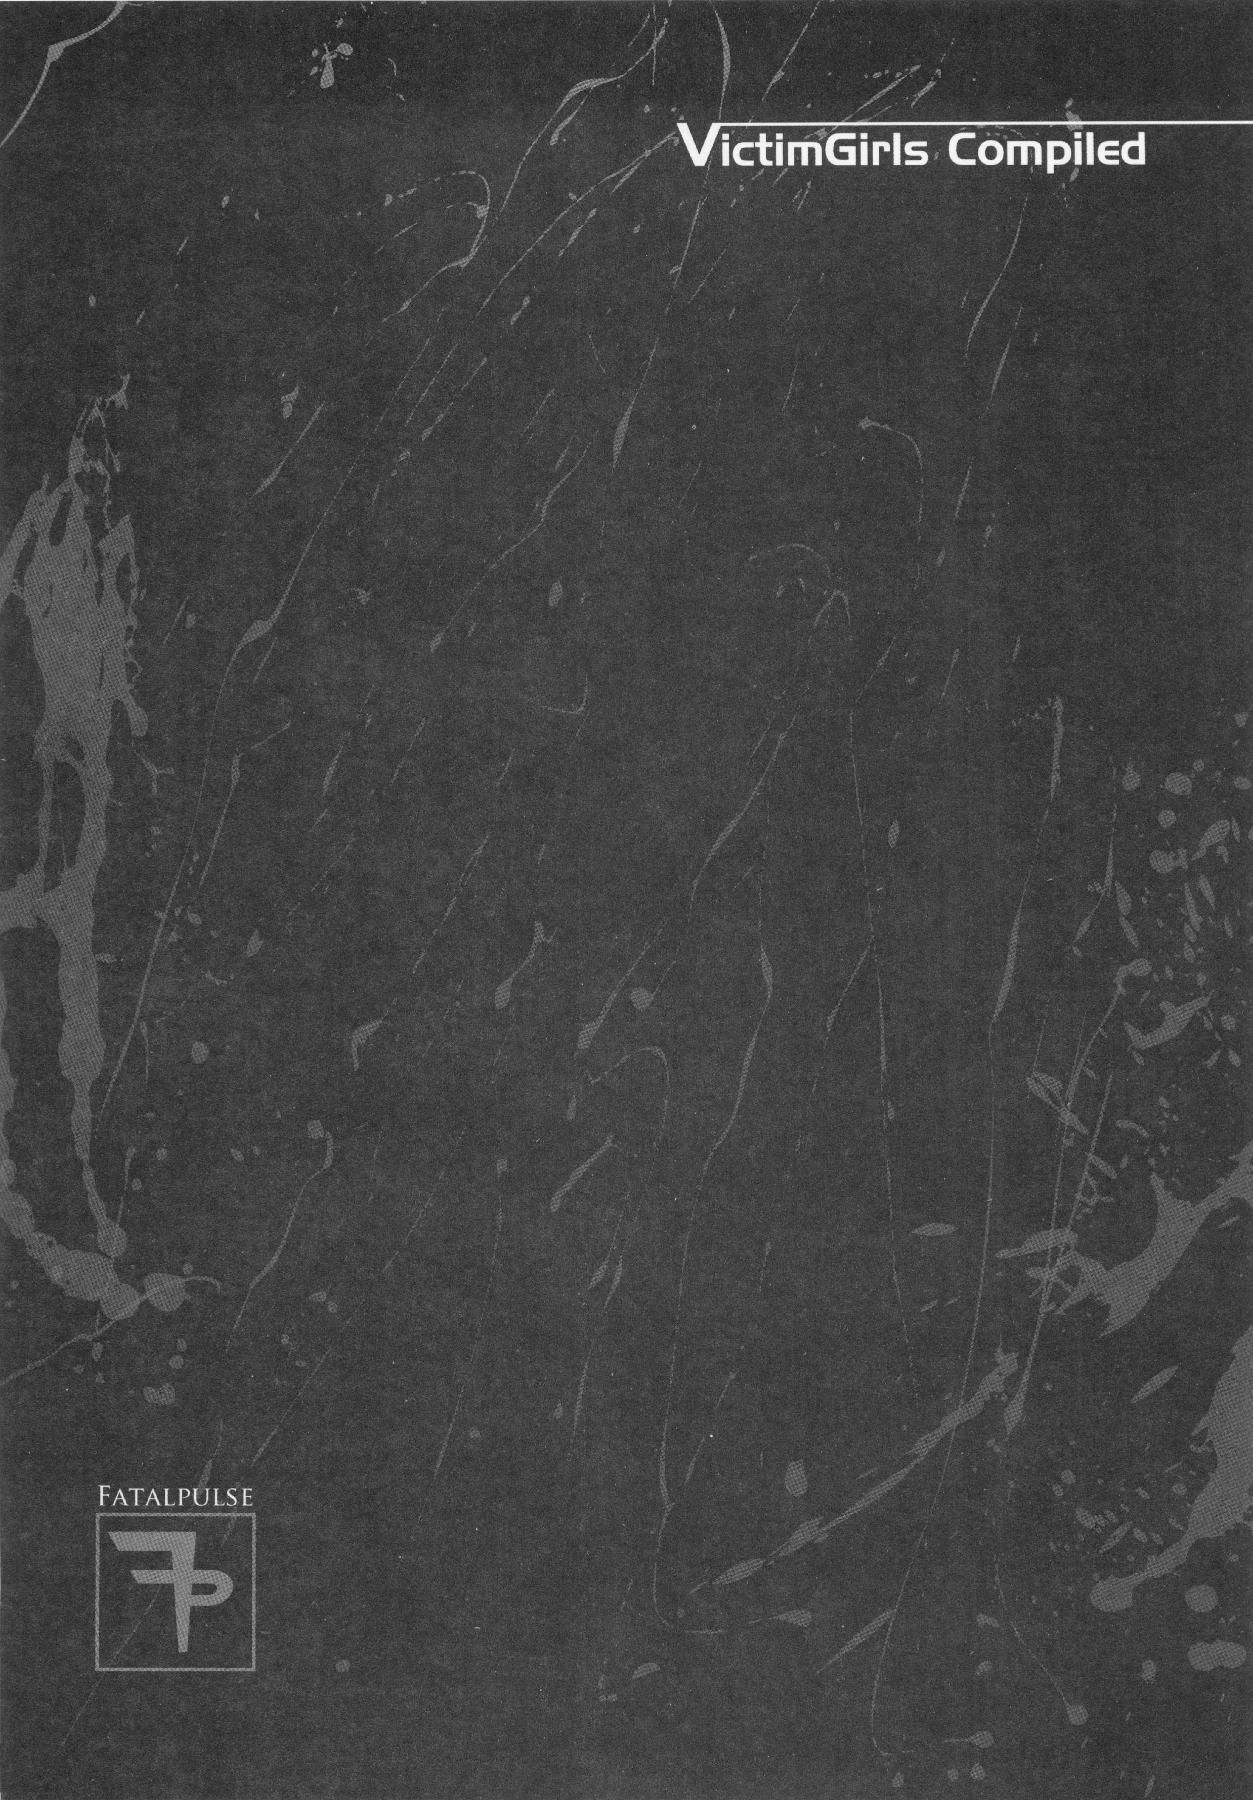 (C83) [Fatalpulse (Asanagi)] VictimGirls Compiled Vol.1 -Victimgirls Soushuuhen 1- MMO Game Selection (Various) 154